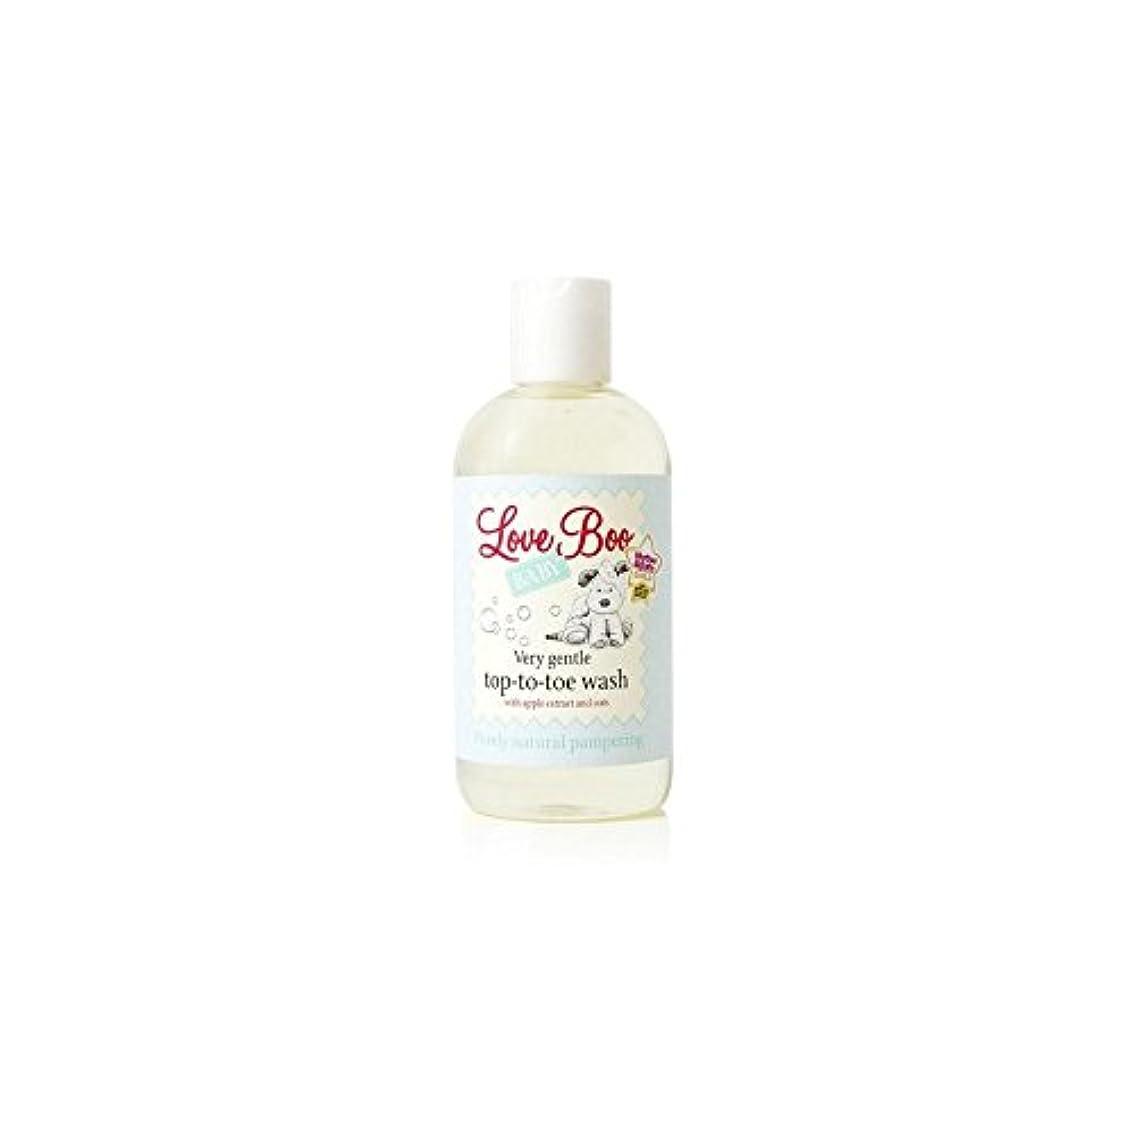 Love Boo Very Gentle Top-To-Toe Wash (250ml) - 愛のブーイング非常に穏やかなトップからつま先まで洗浄(250ミリリットル) [並行輸入品]